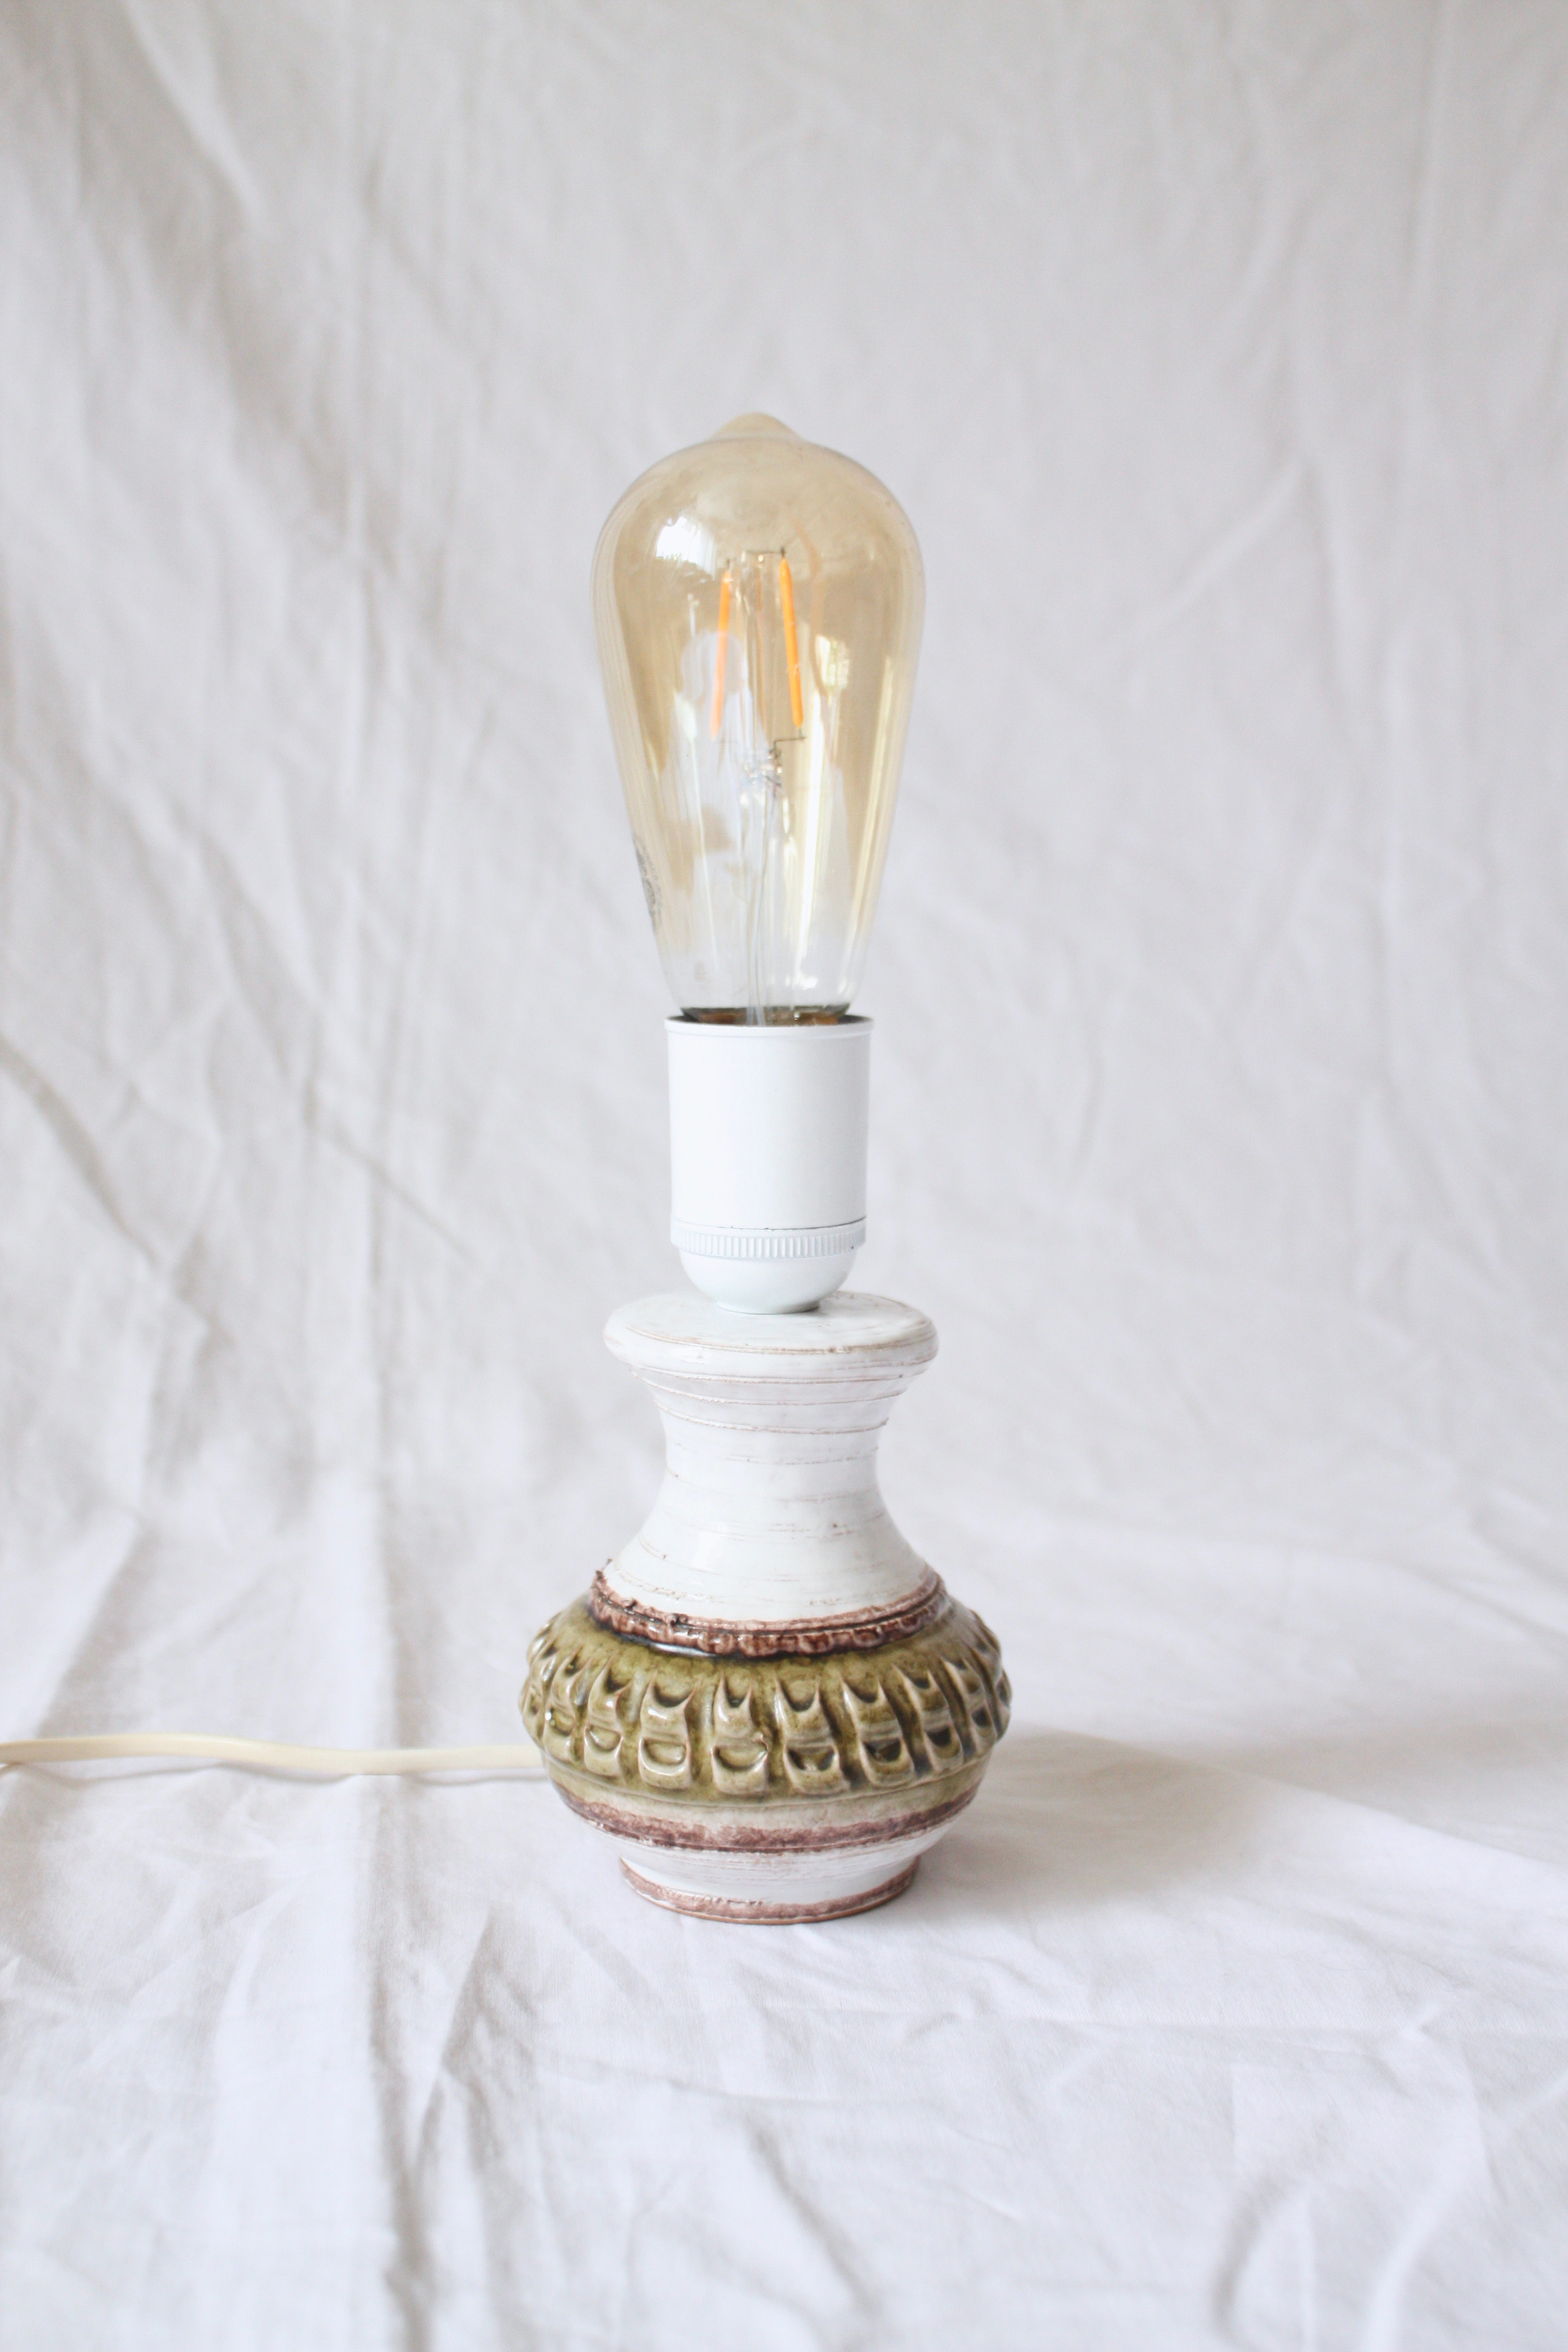 Retro lampfot i keramik vit/grön/brun